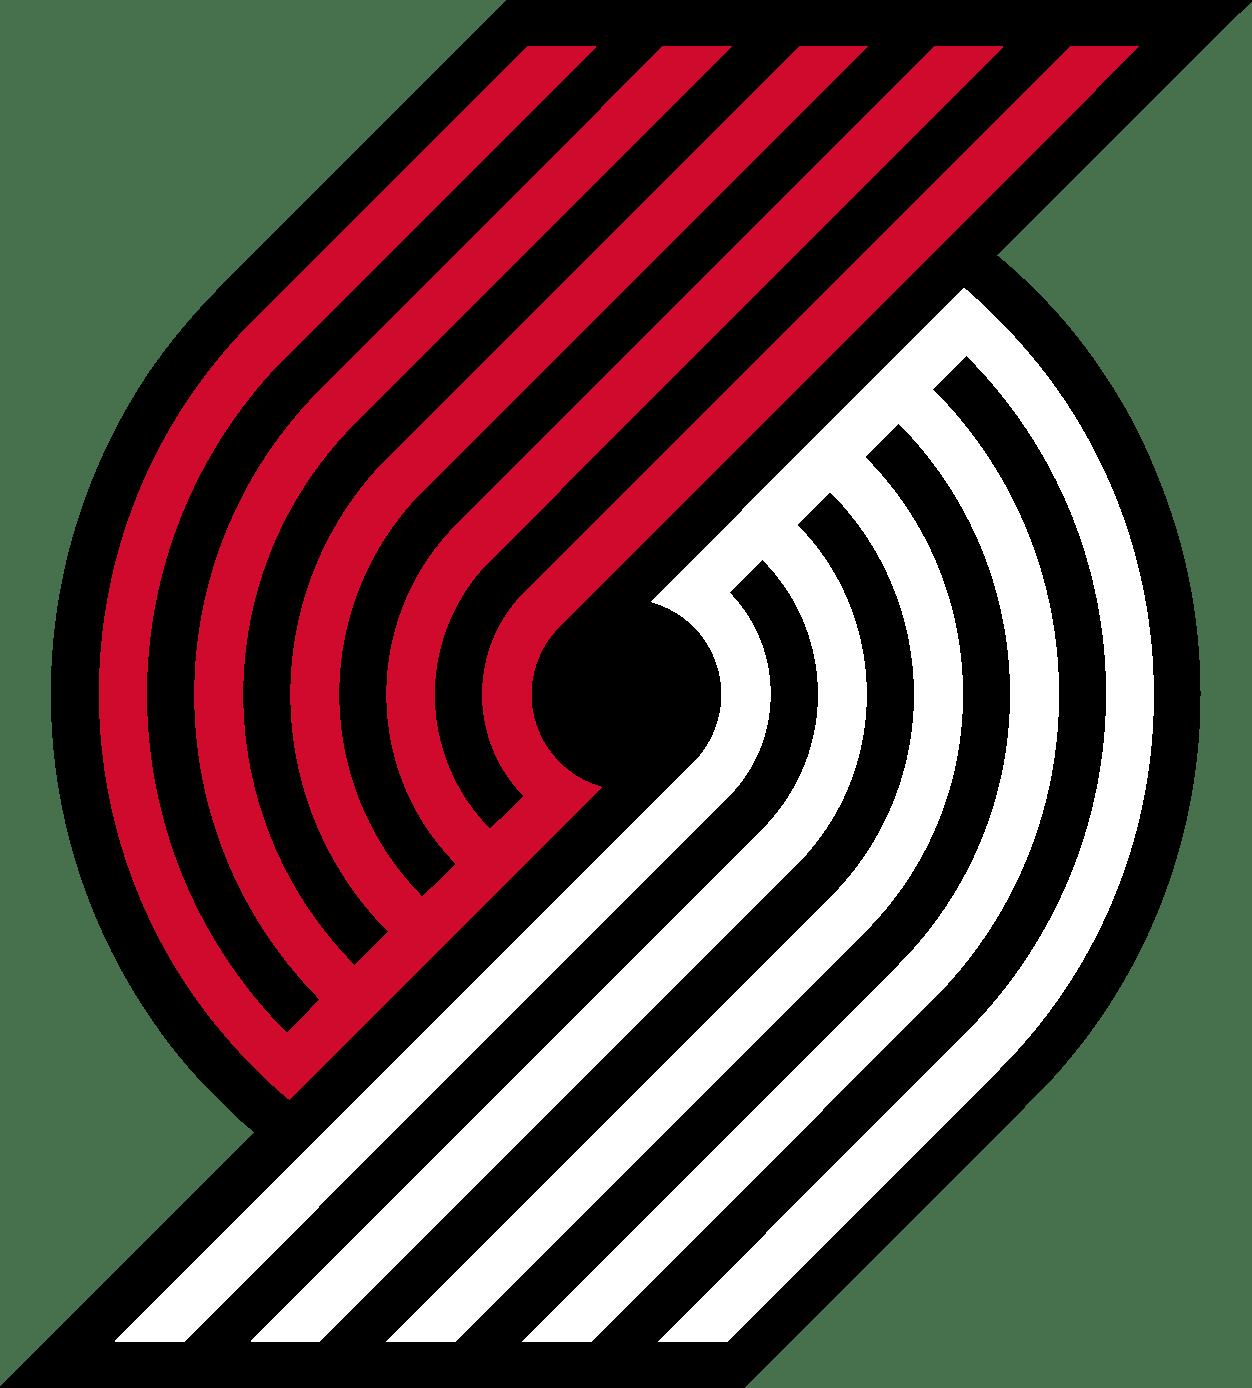 Portland Trail Blazers Art: Portland Trail Blazers Logo Vector Free Download